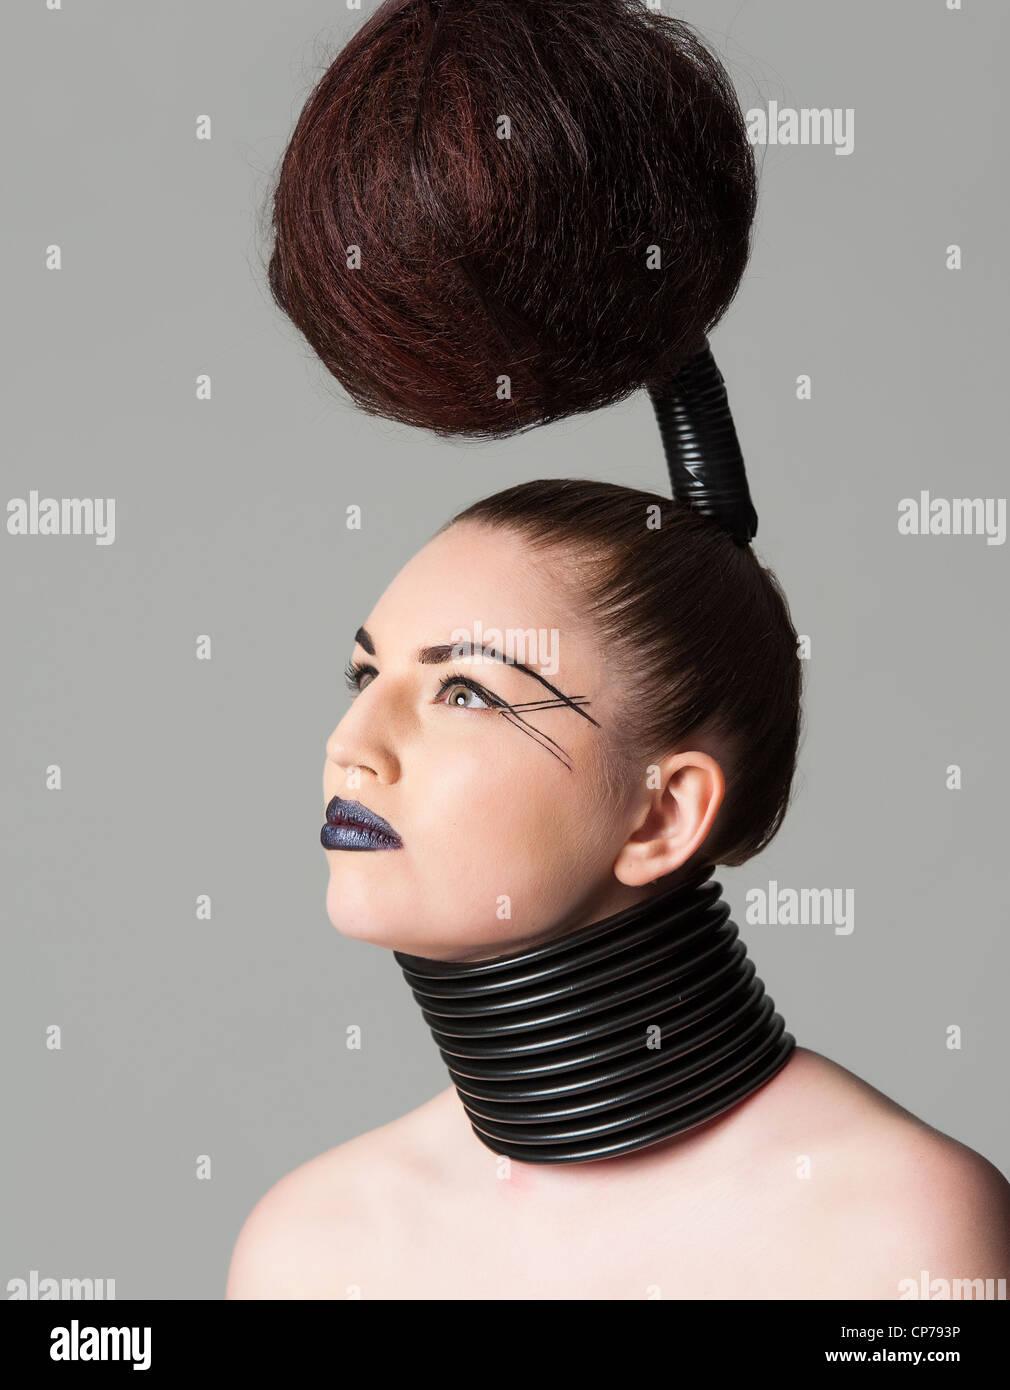 a crazy avant garde hairstyle Stock Photo: 48103994 - Alamy